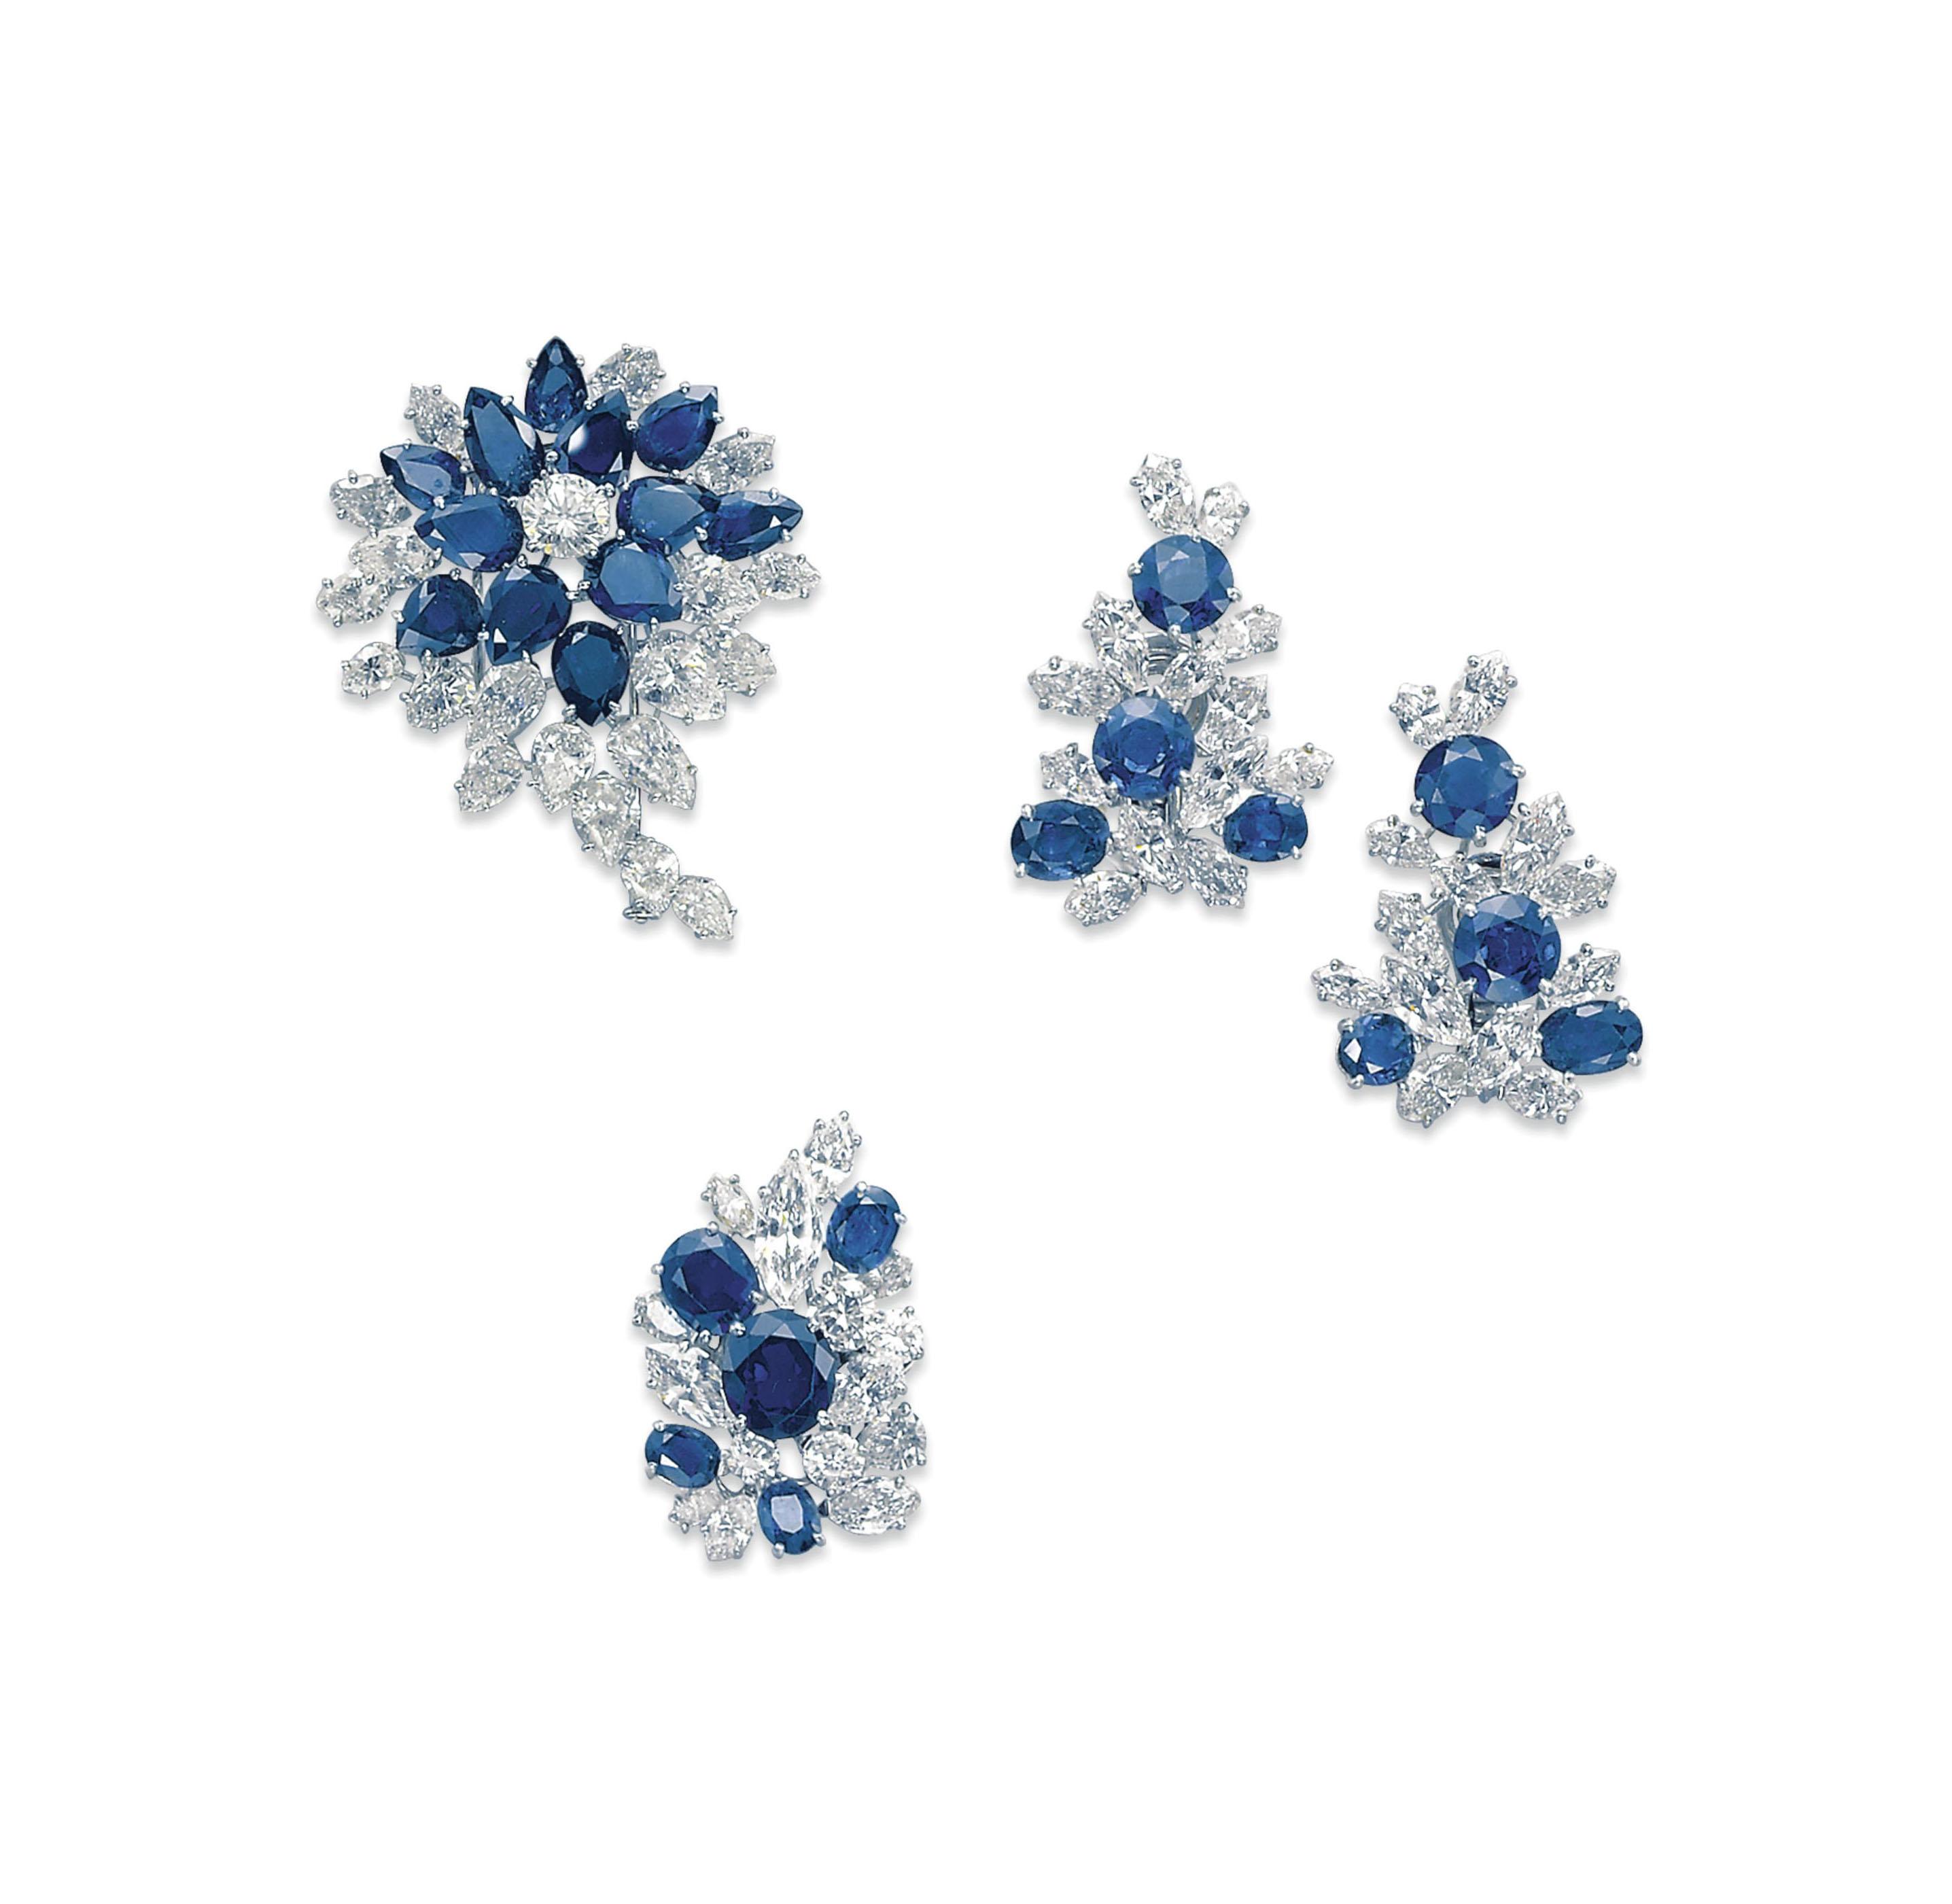 A SET OF SAPPHIRE AND DIAMOND JEWELLERY, BY FARAONE